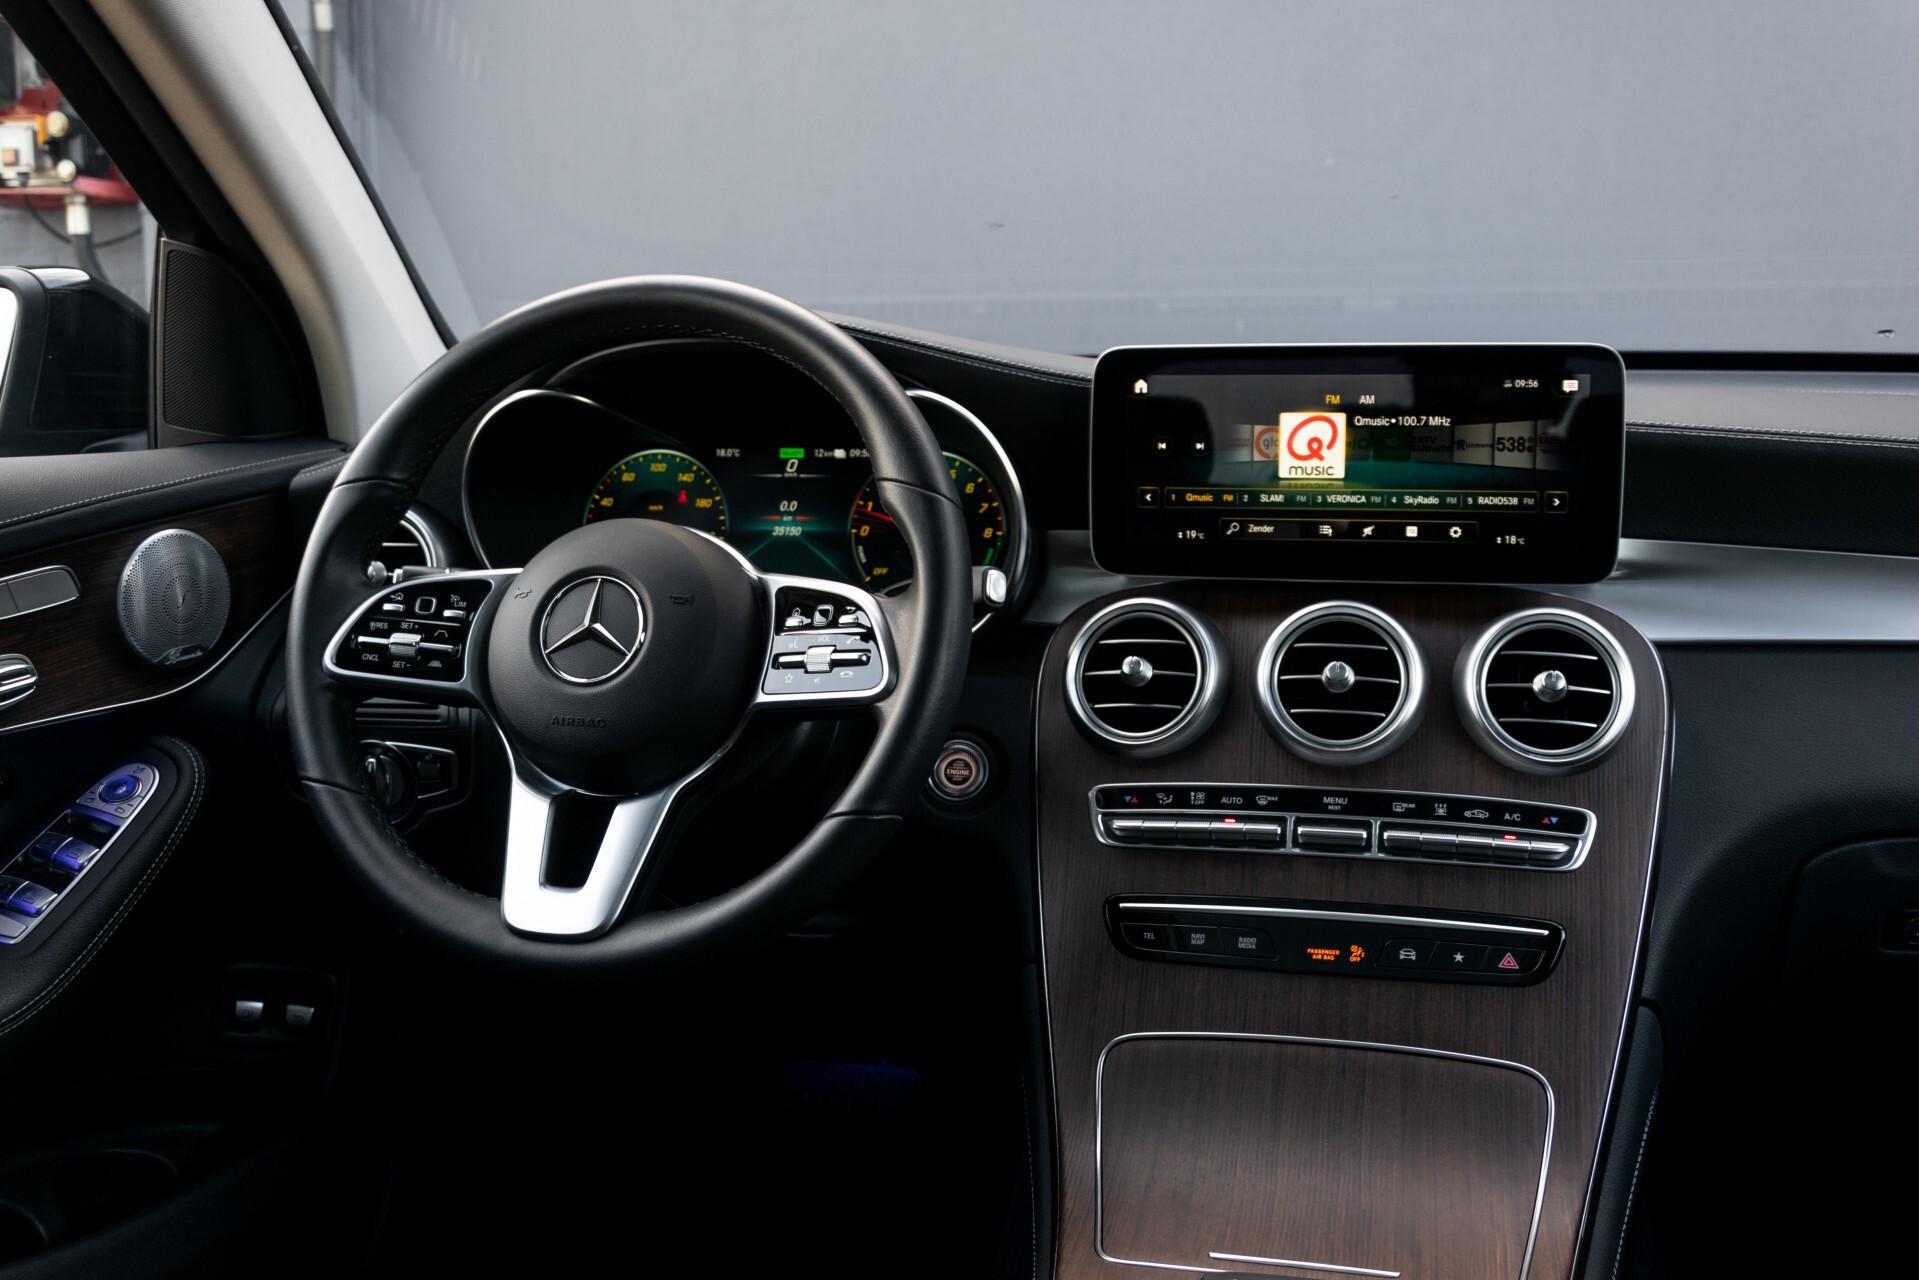 Mercedes-Benz GLC 300e 4-M Luchtvering/Panorama/Multicontourstoelen/Rij-assistentie/Standkachel Aut9 Foto 7